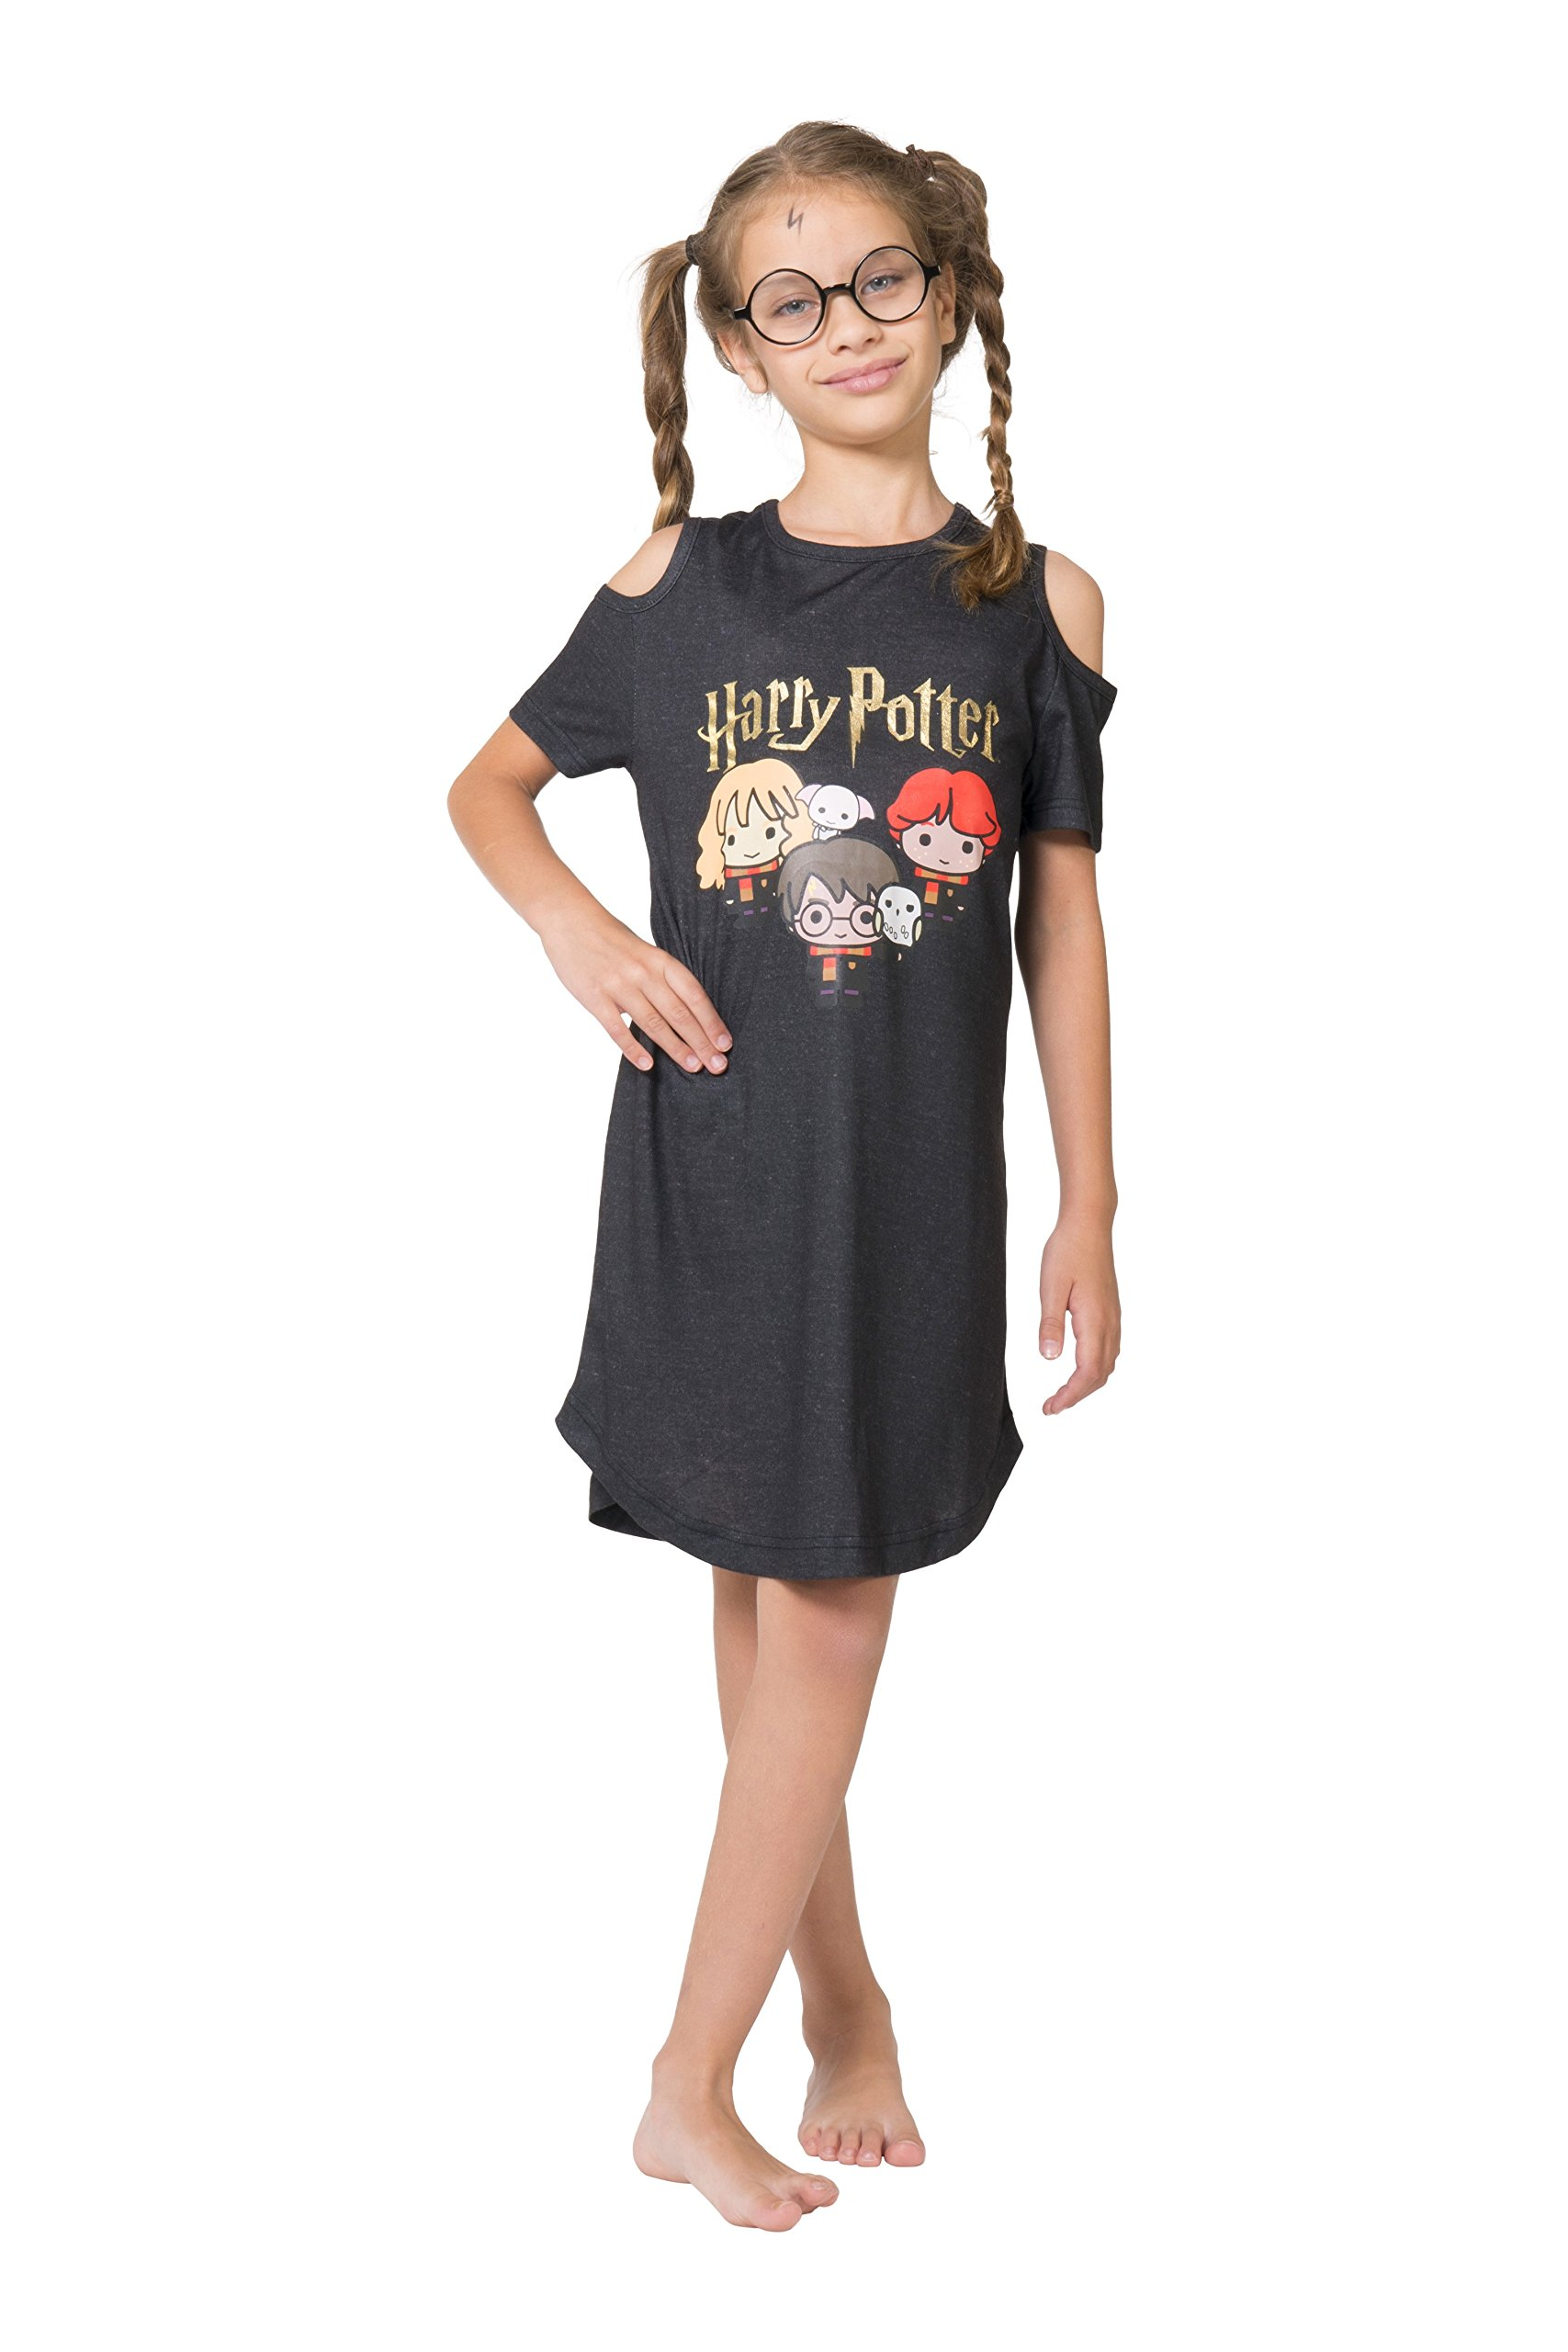 Harry Potter Girls' Big Chibi Art Cold Shoulder Nightgown, Charcoal Gray, 7/8